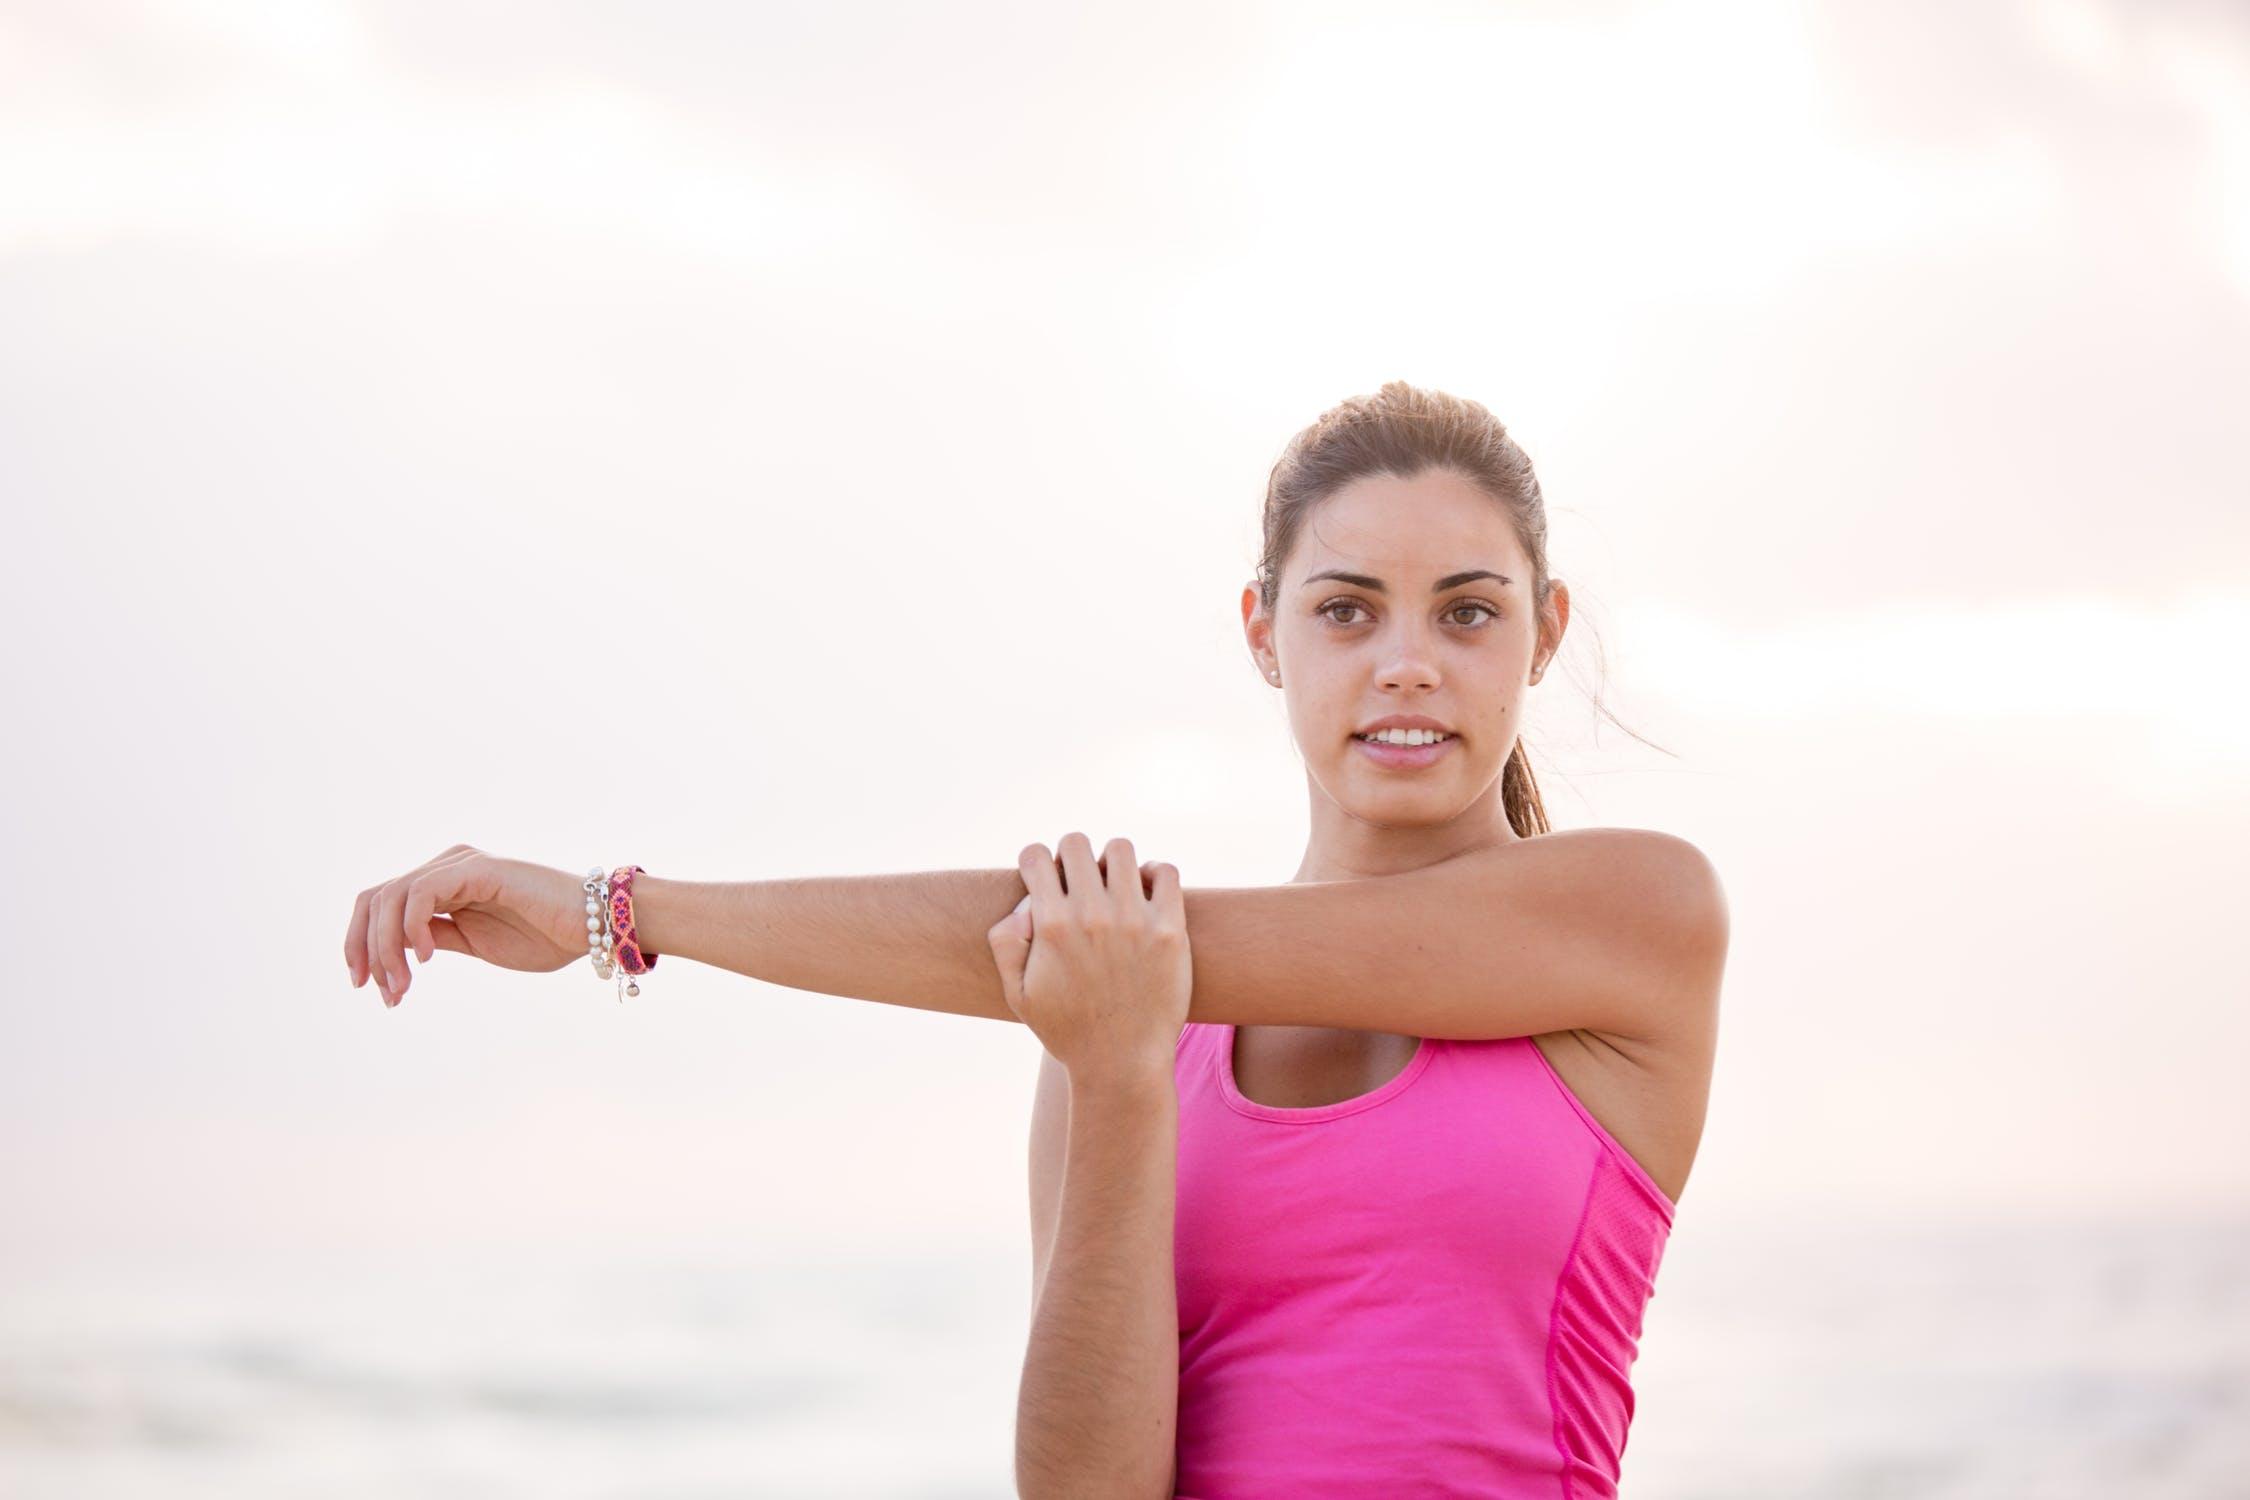 ¿Por qué acudir a fisioterapia?